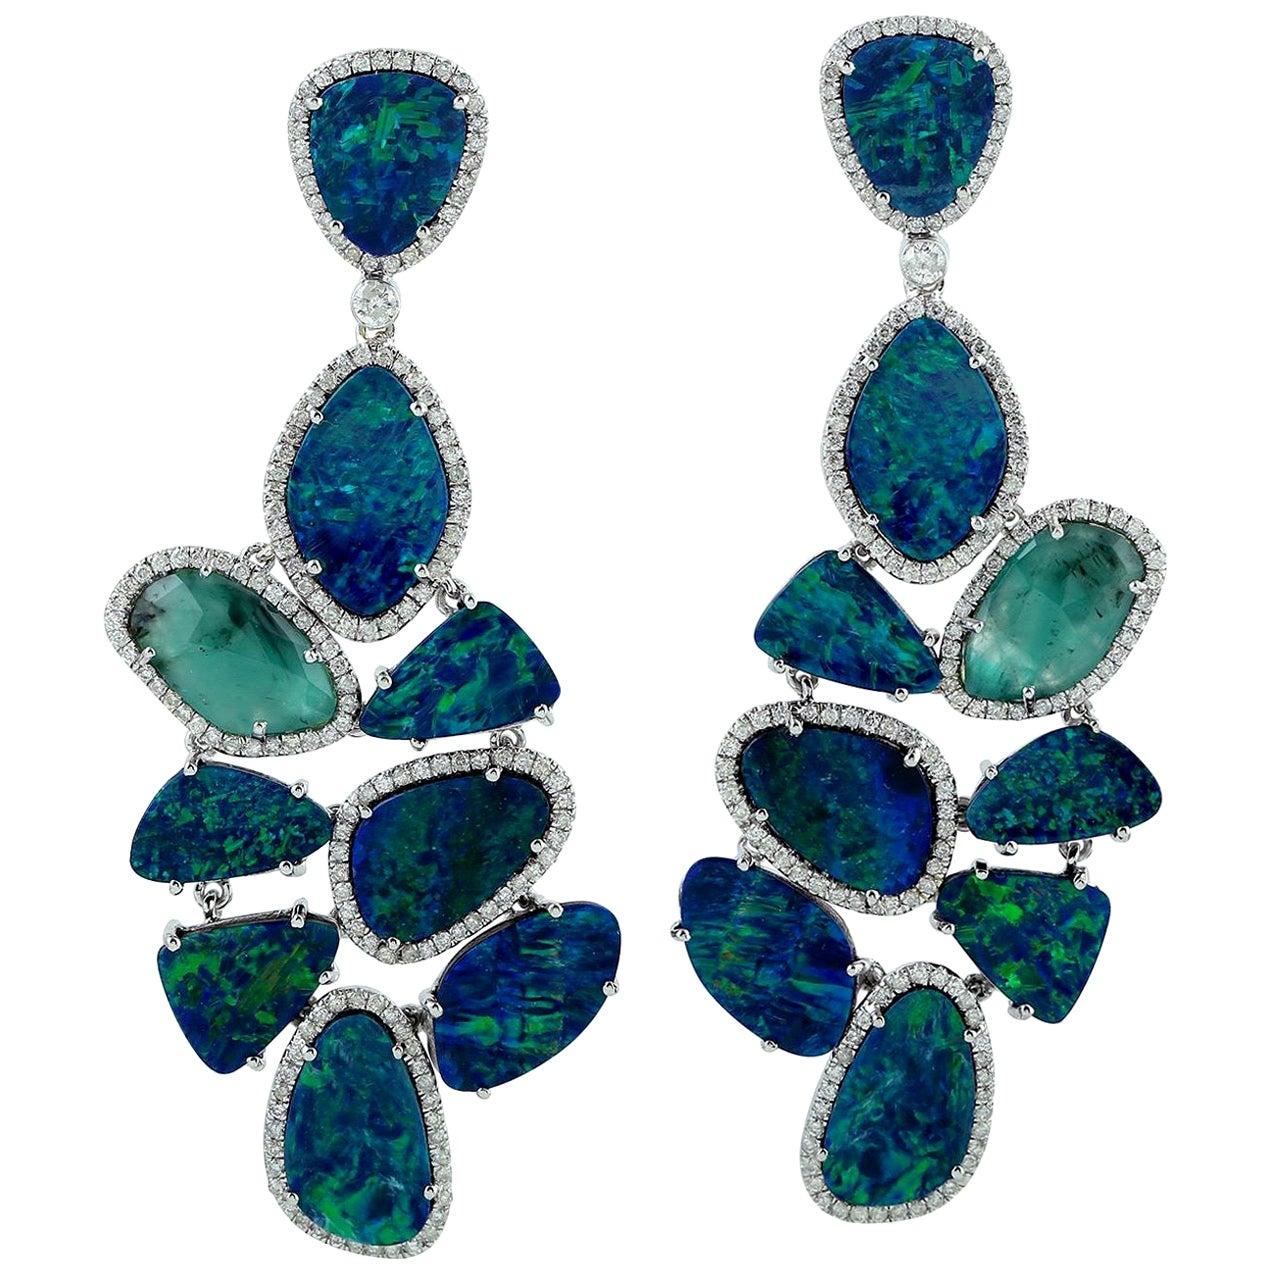 22.57 Carat Opal Emerald Diamond 18 Karat Gold Earrings